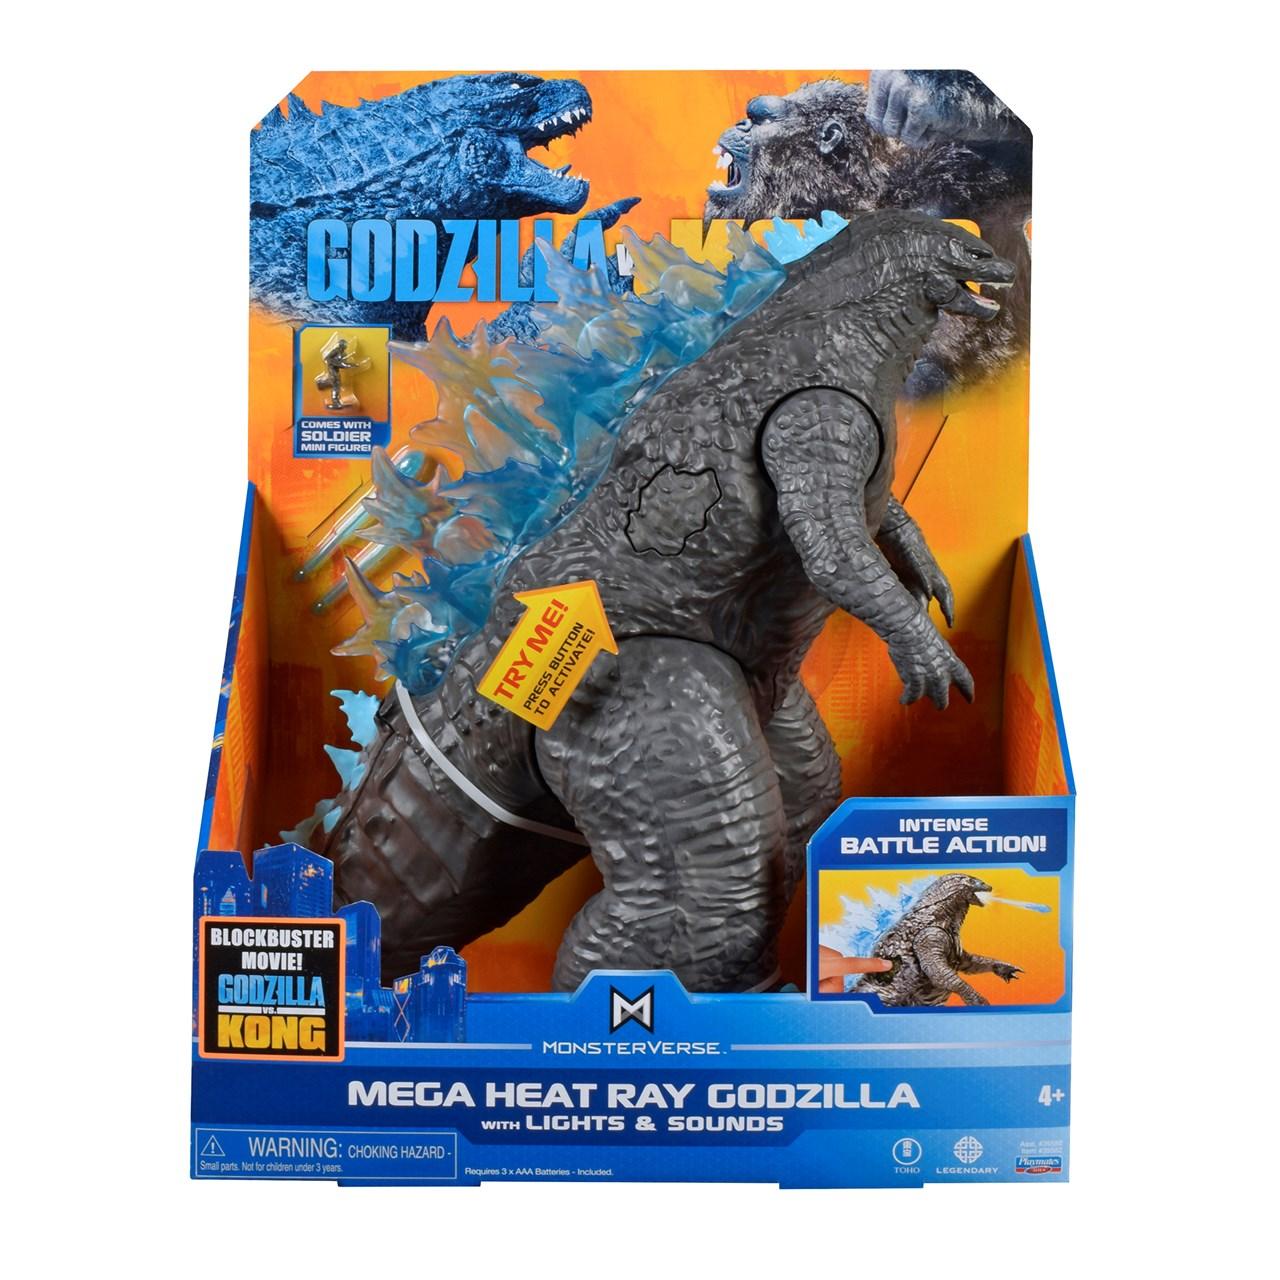 Monsterverse Godzilla vs Kong: Mega Godzilla with Lights & Sounds Action Figure - 5